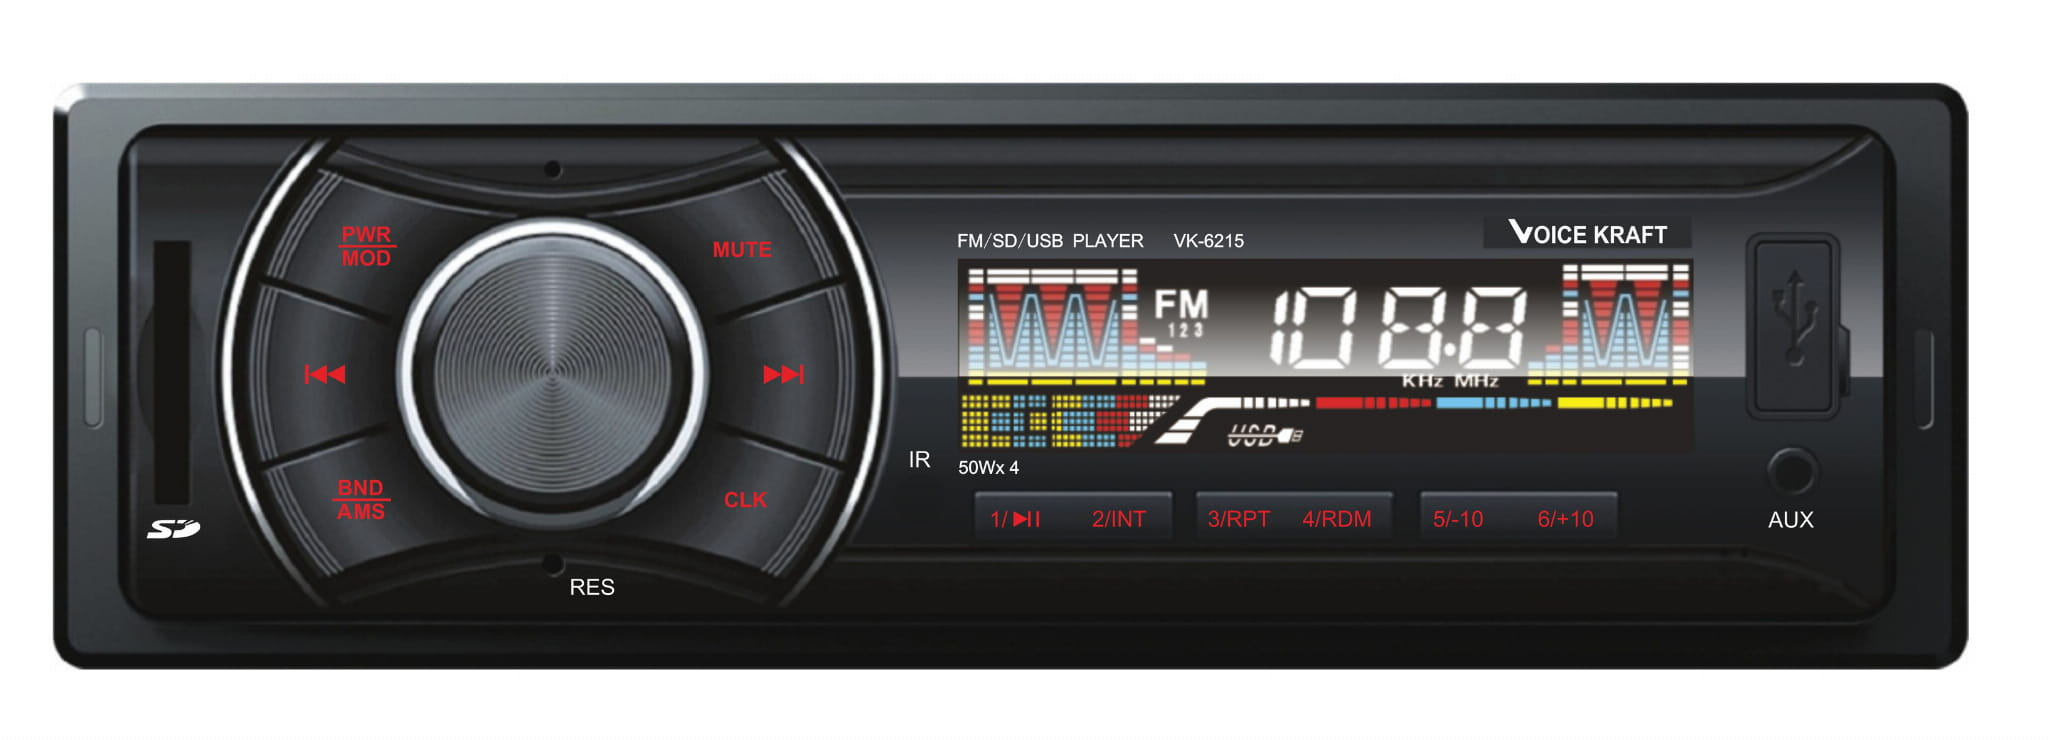 VOICE KRAFT car audio VK-6215-RD MP3-FM AUX/SD/USB, χειριστήριο, κόκκινο - VOICE KRAFT 26681